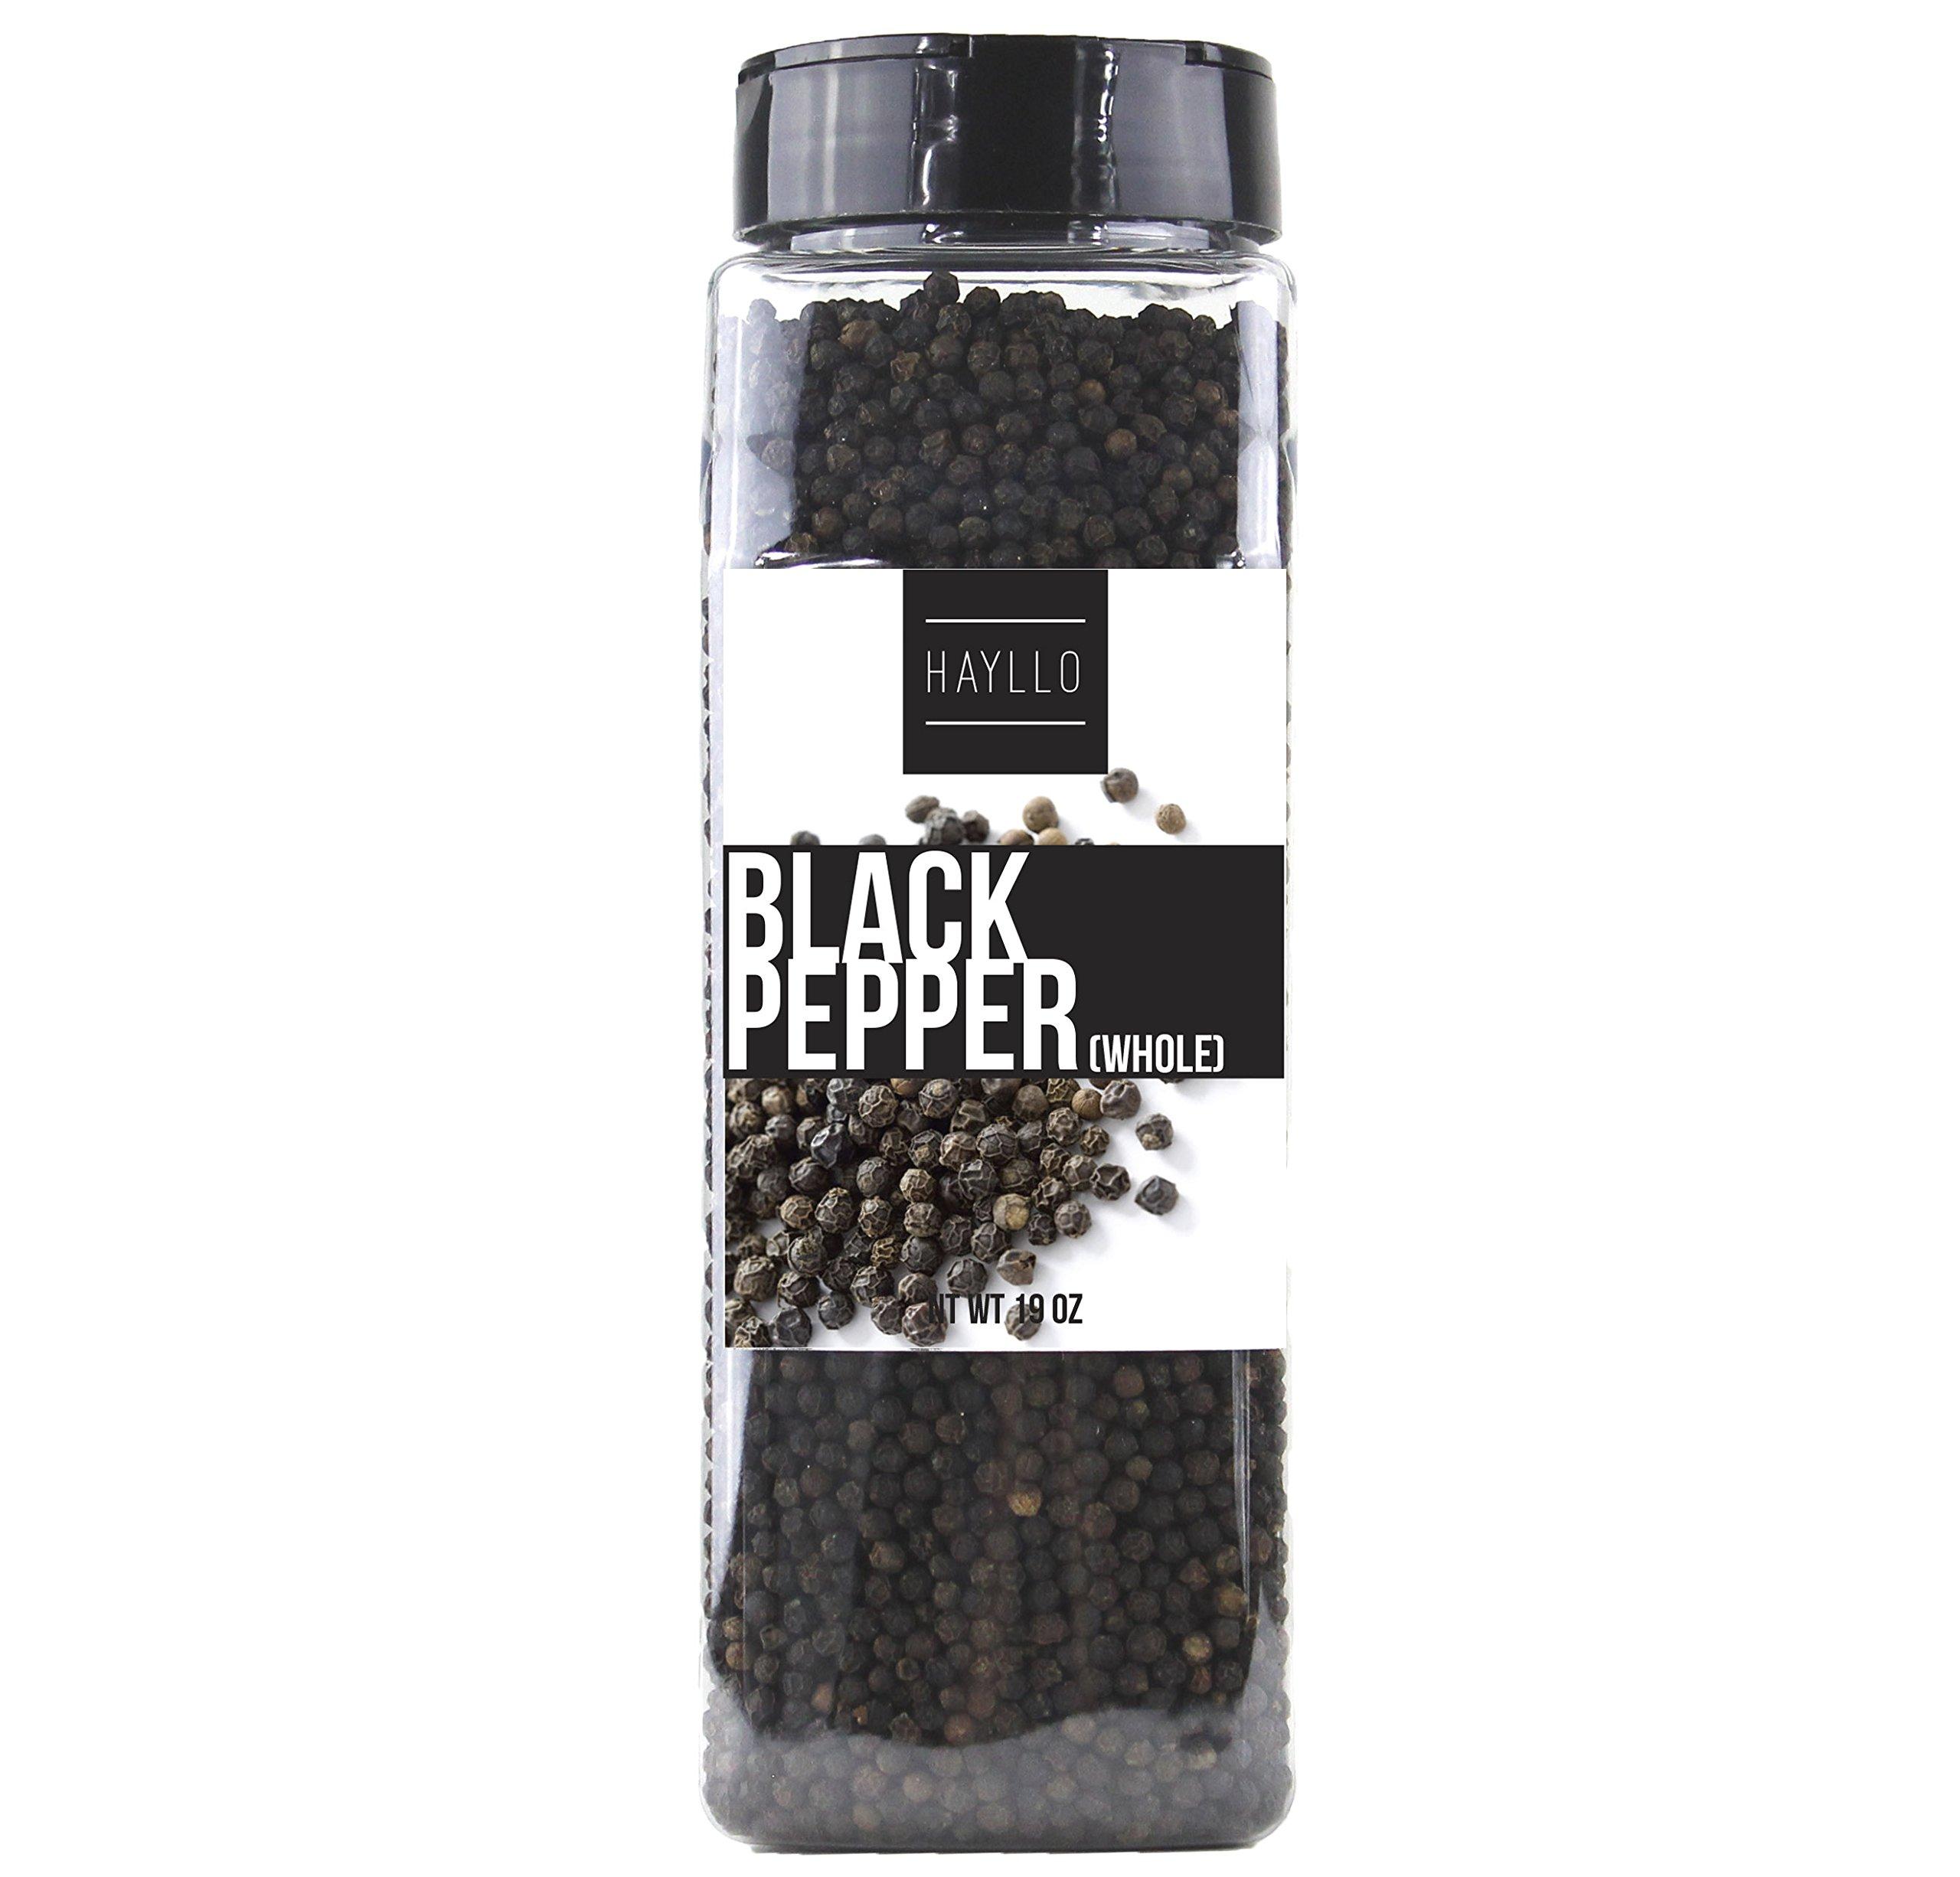 Hayllo Black Pepper Whole (Peppercorns) , 19 Ounce